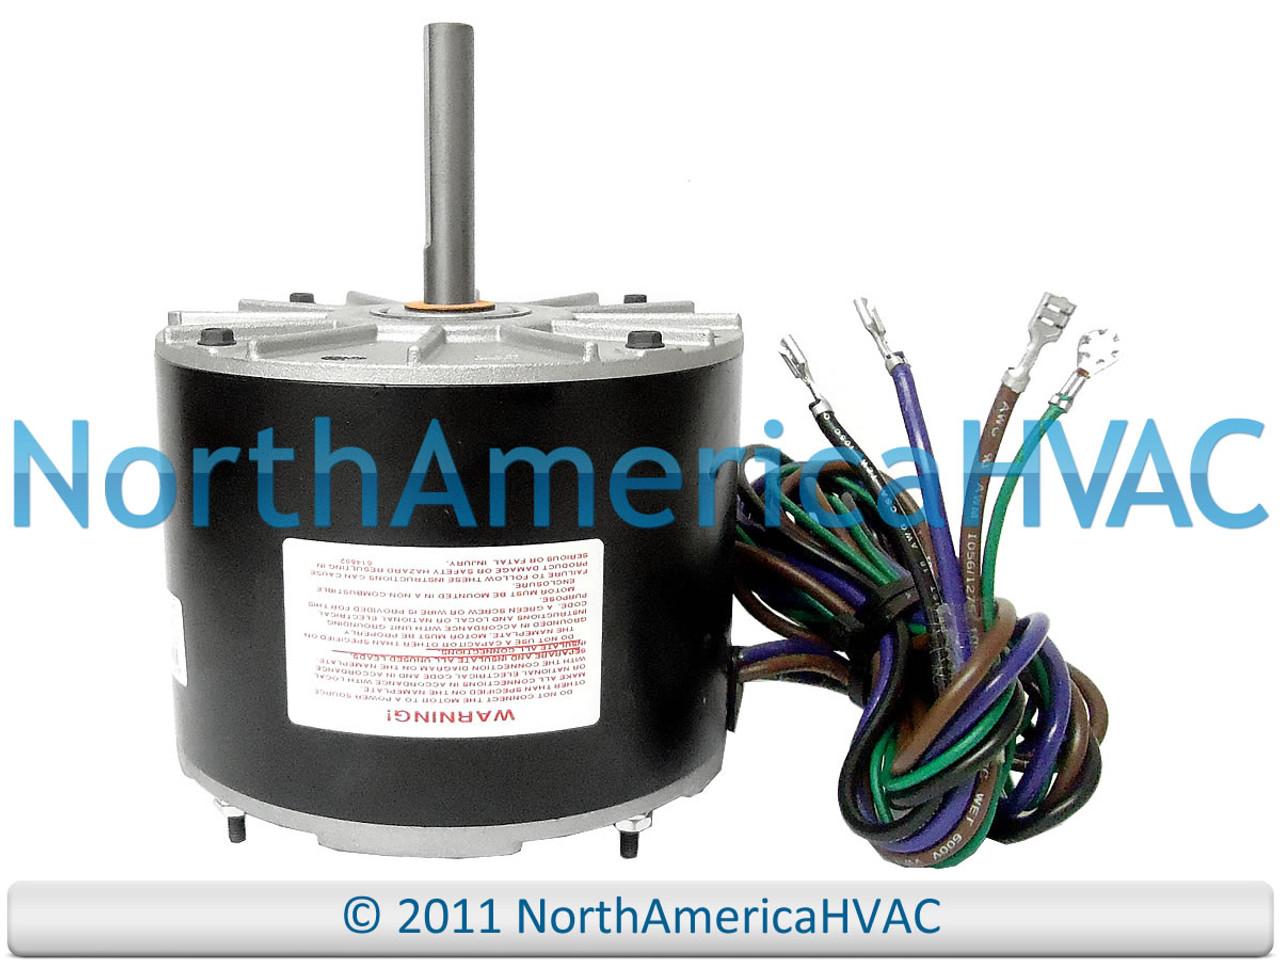 OEM York Coleman FAN MOTOR 1/4 HP 208-230v 024-36243-000 S1-02436243000 -  North America HVACNorth America HVAC